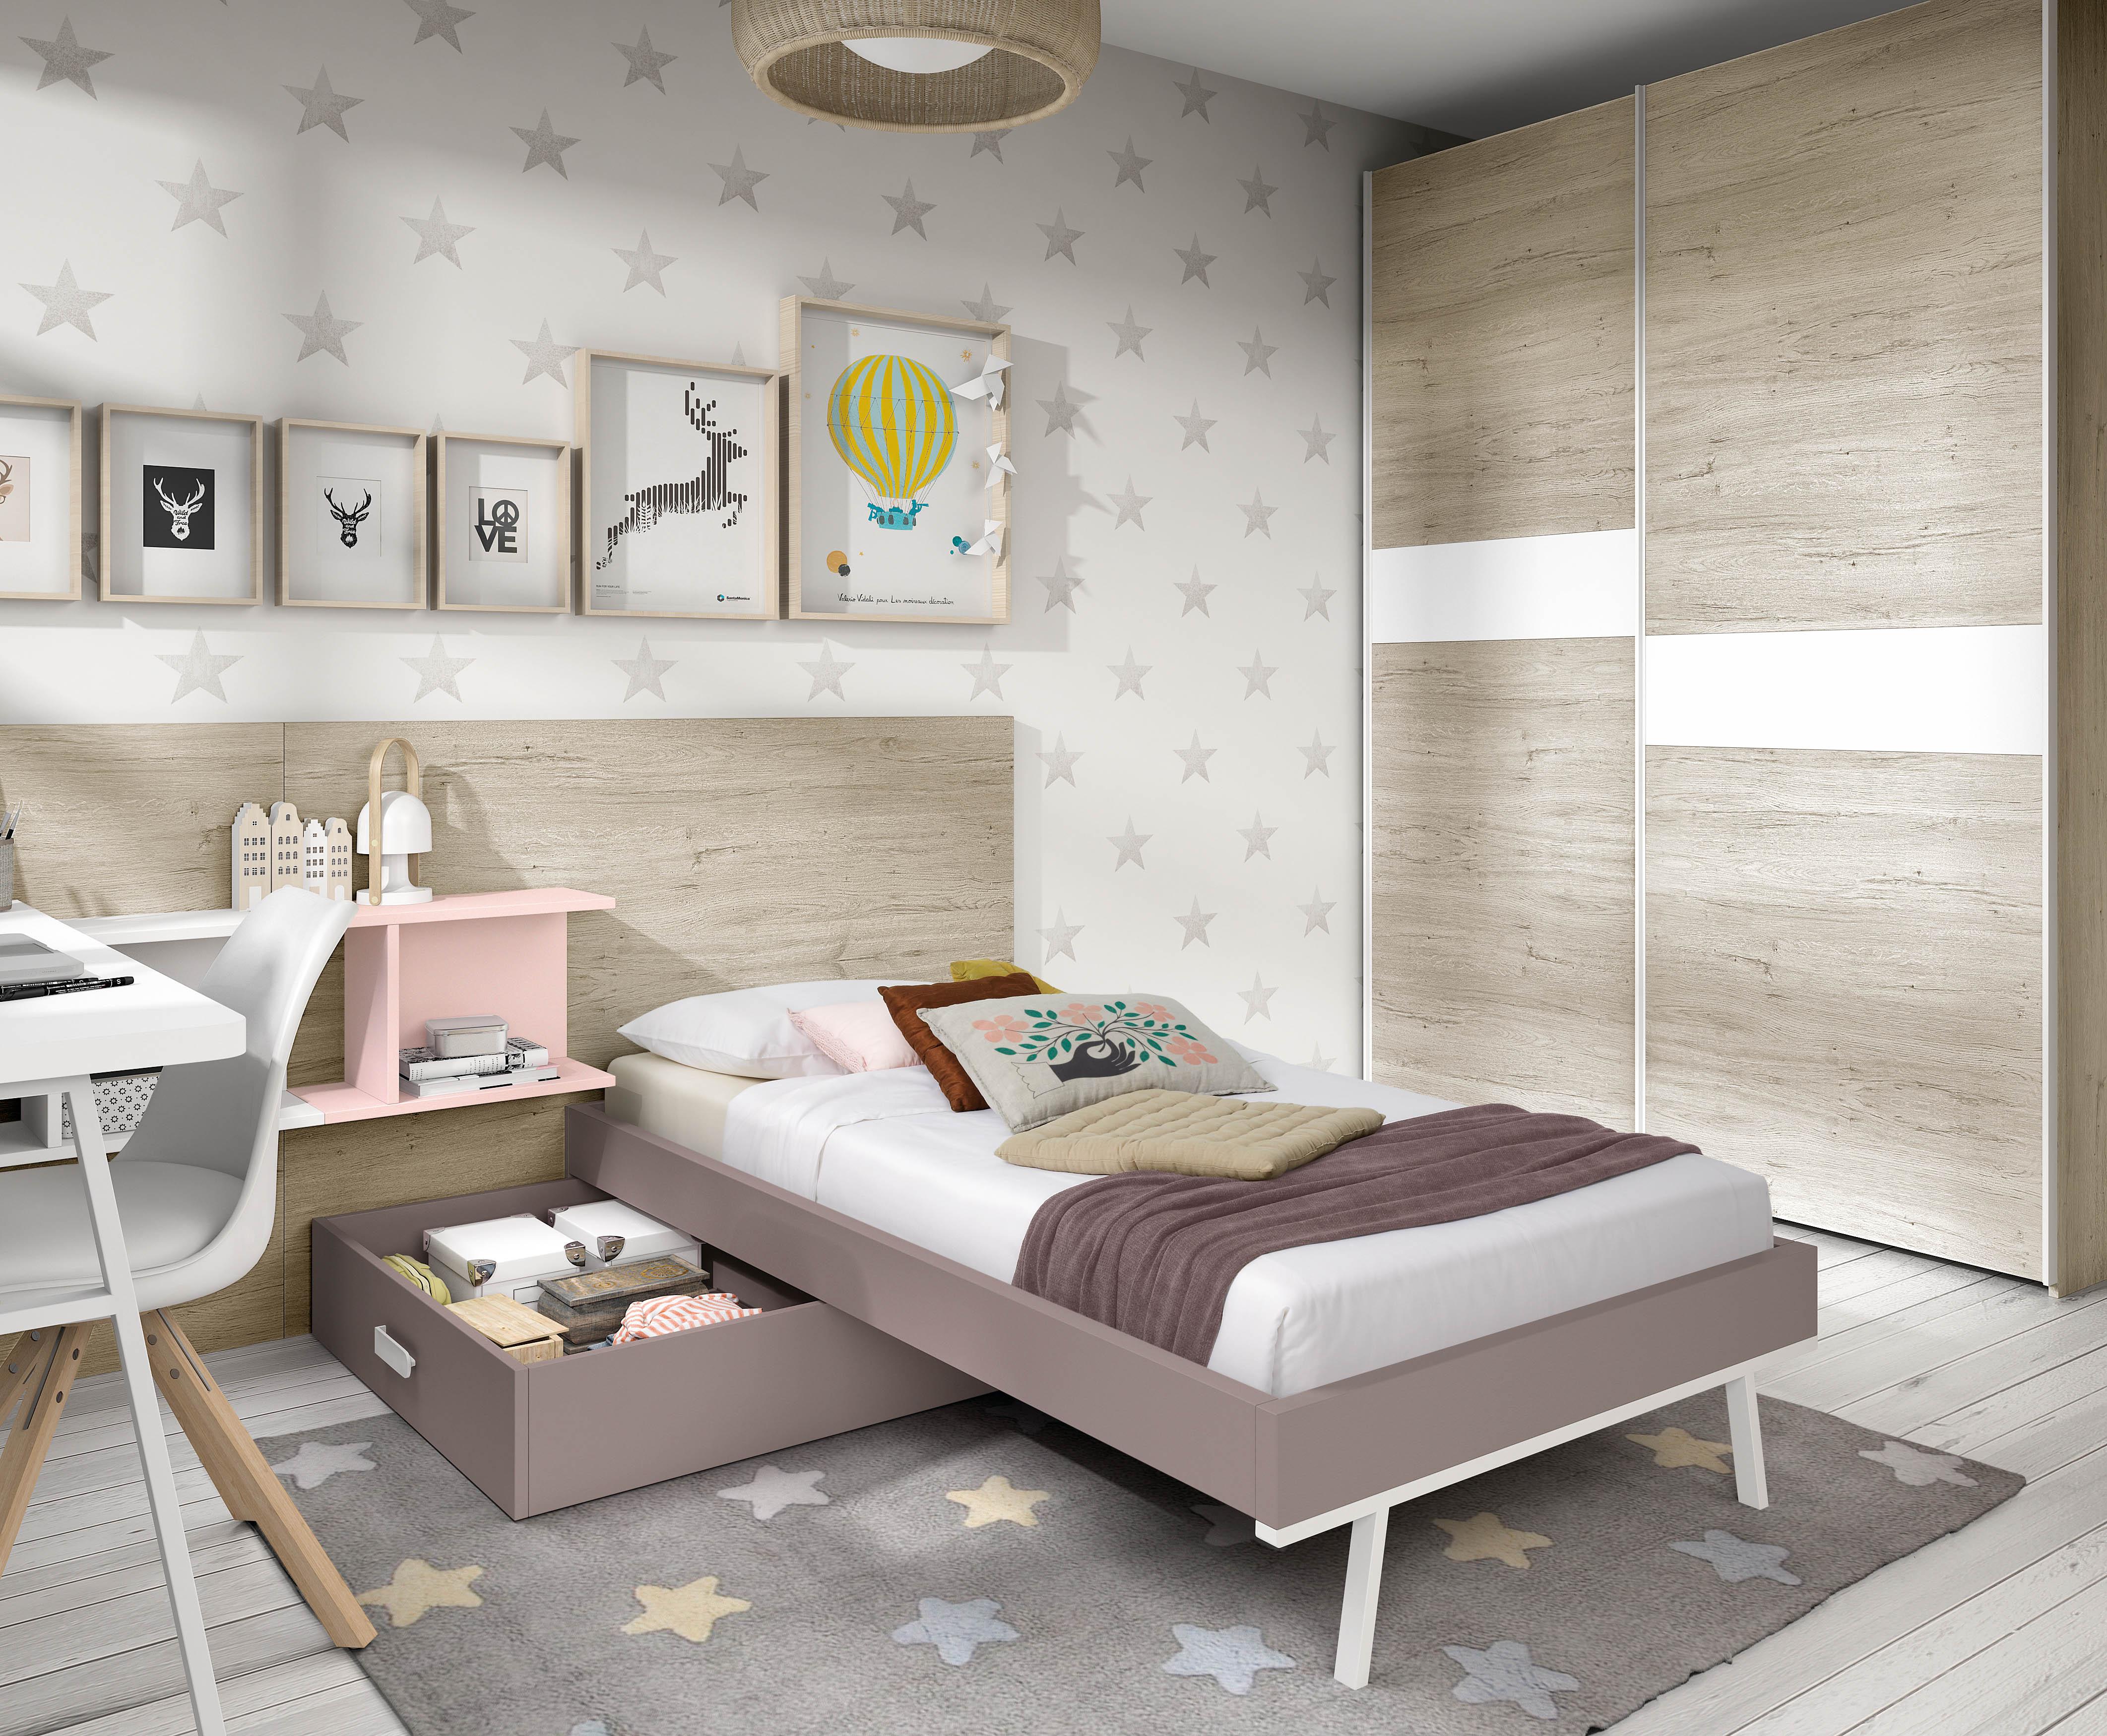 Muebles juveniles camas individuales dormitorios juveniles for Camas individuales juveniles